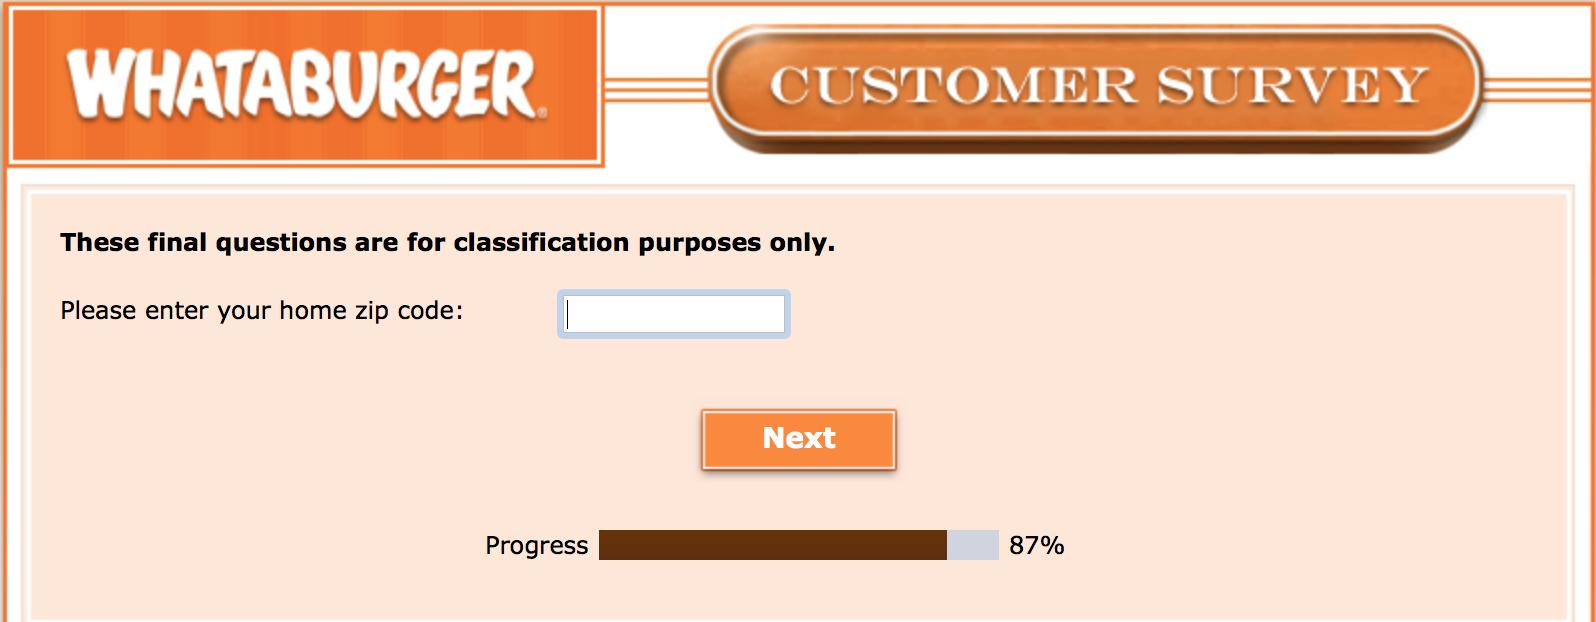 Whataburger Survey 29